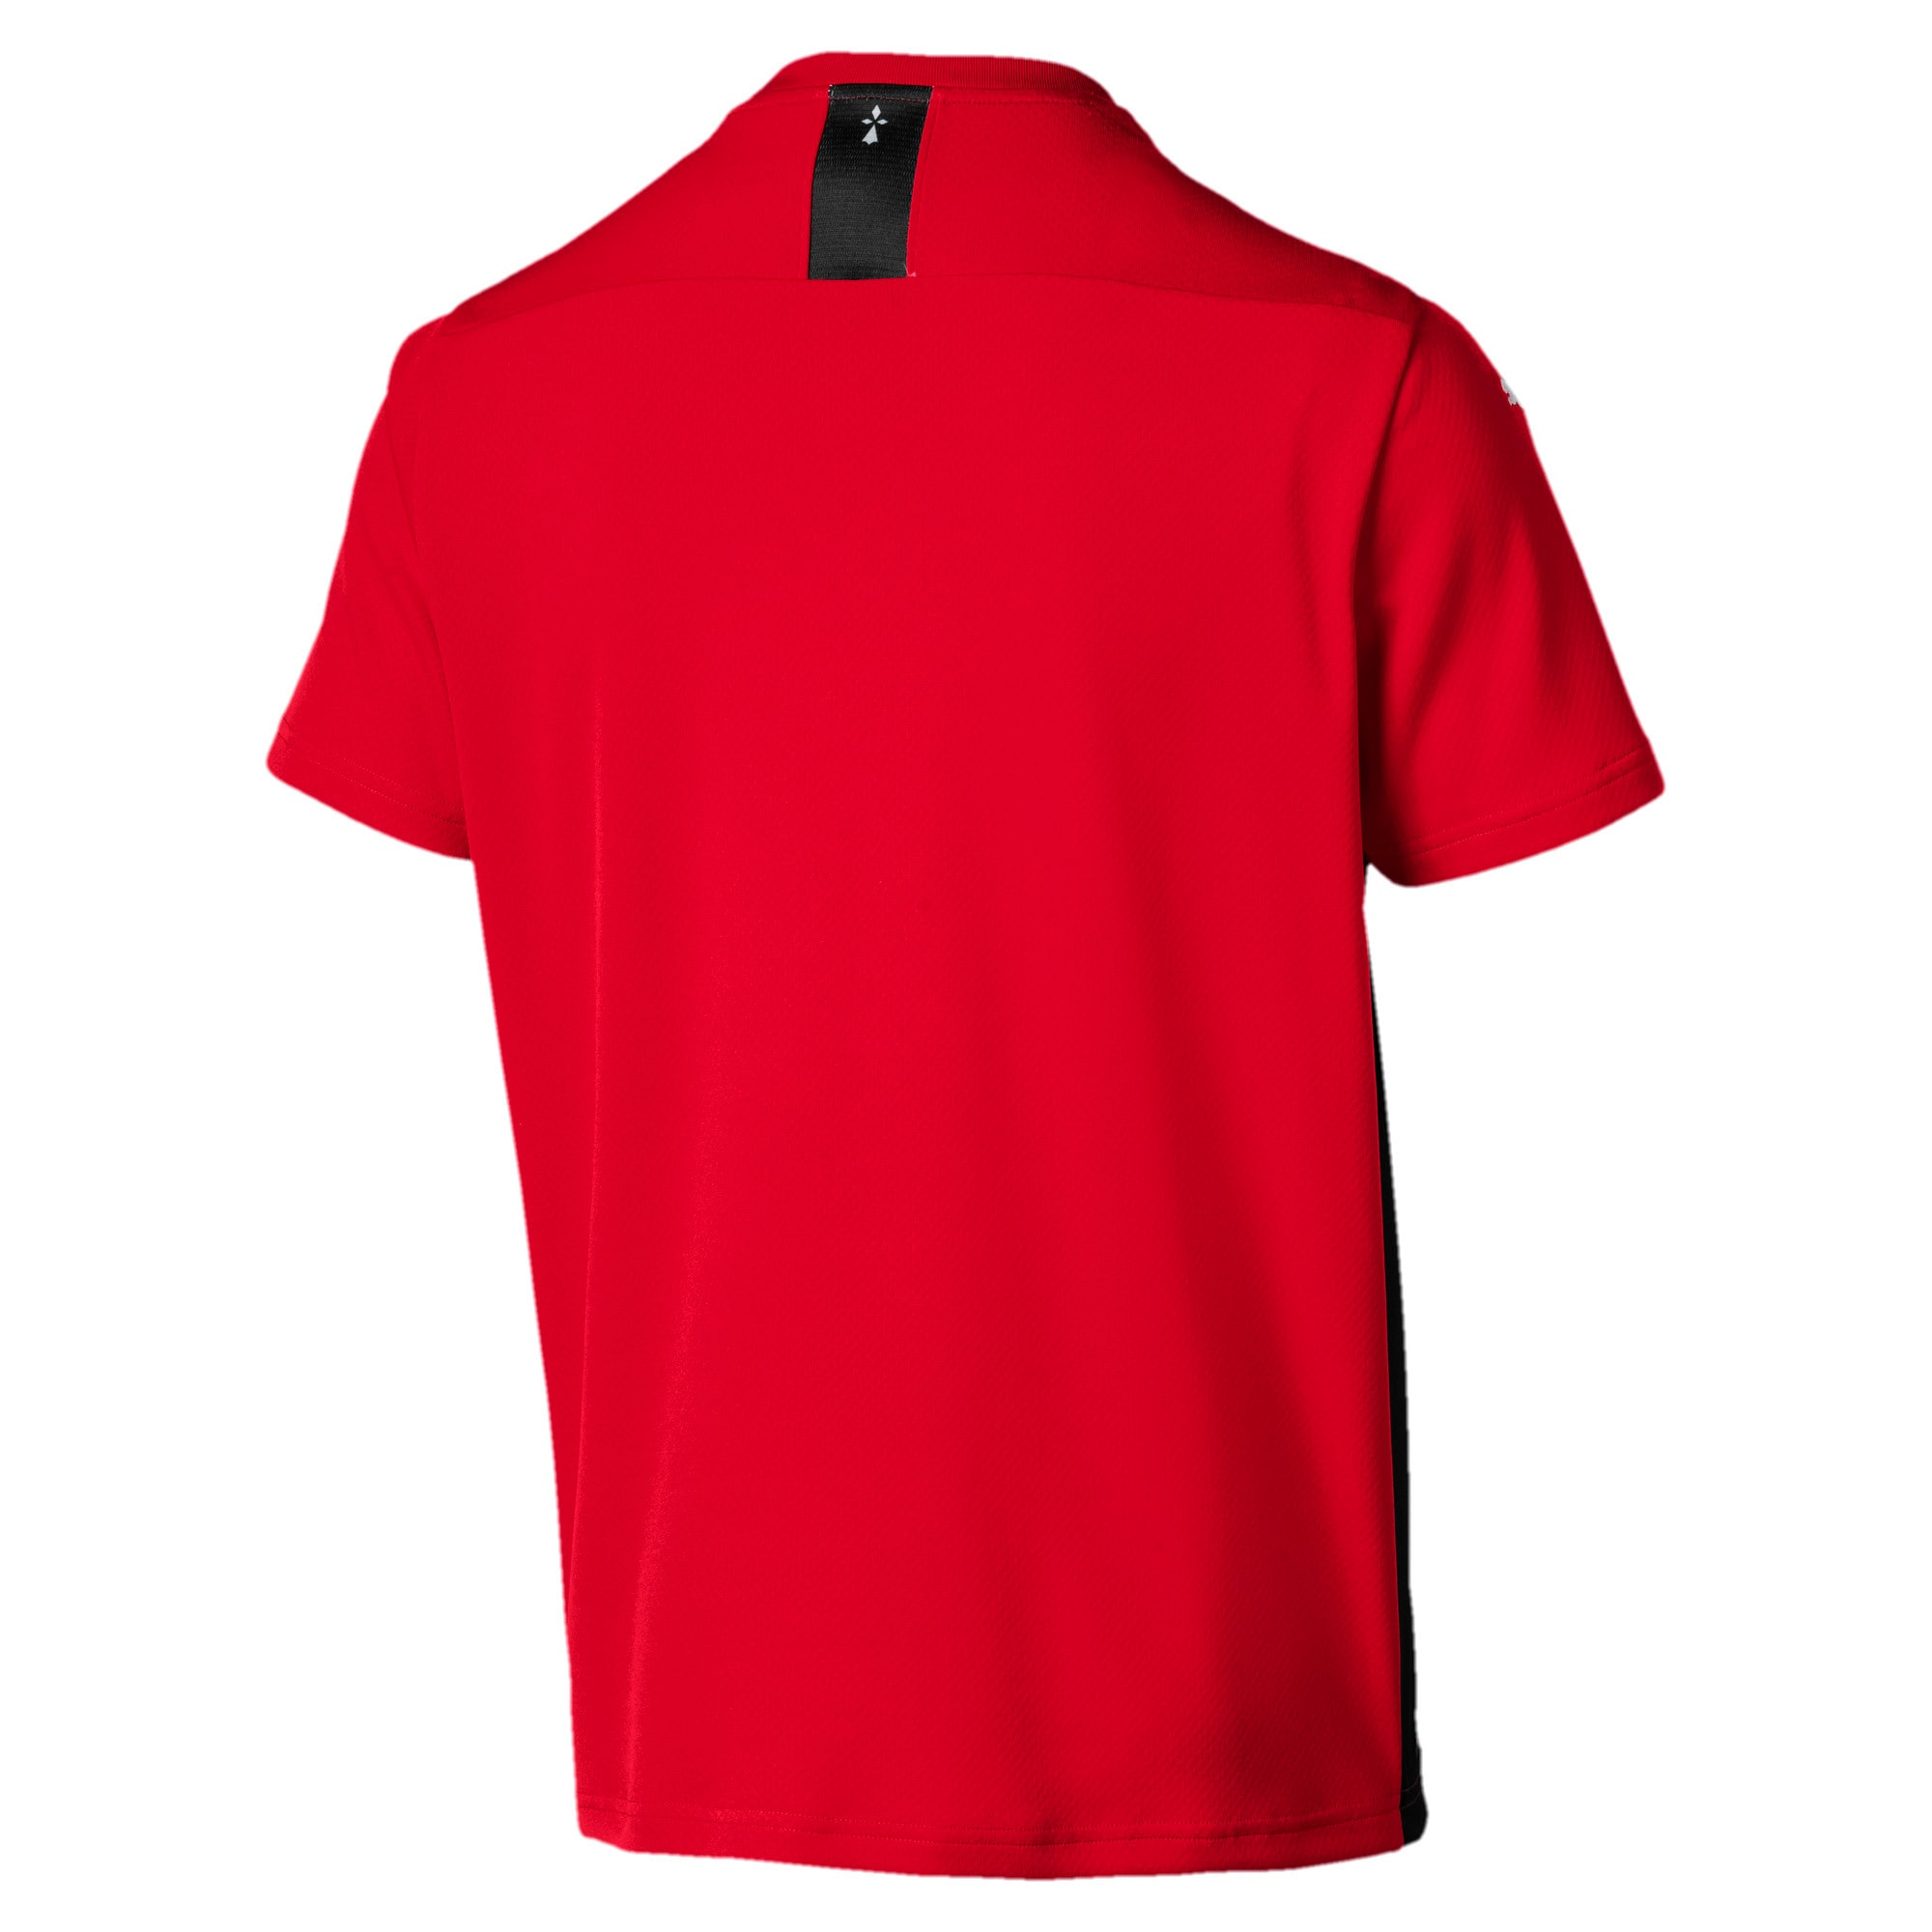 Thumbnail 2 of Stade Rennais FC Men's Home Replica Jersey, Puma Red-Puma Black, medium